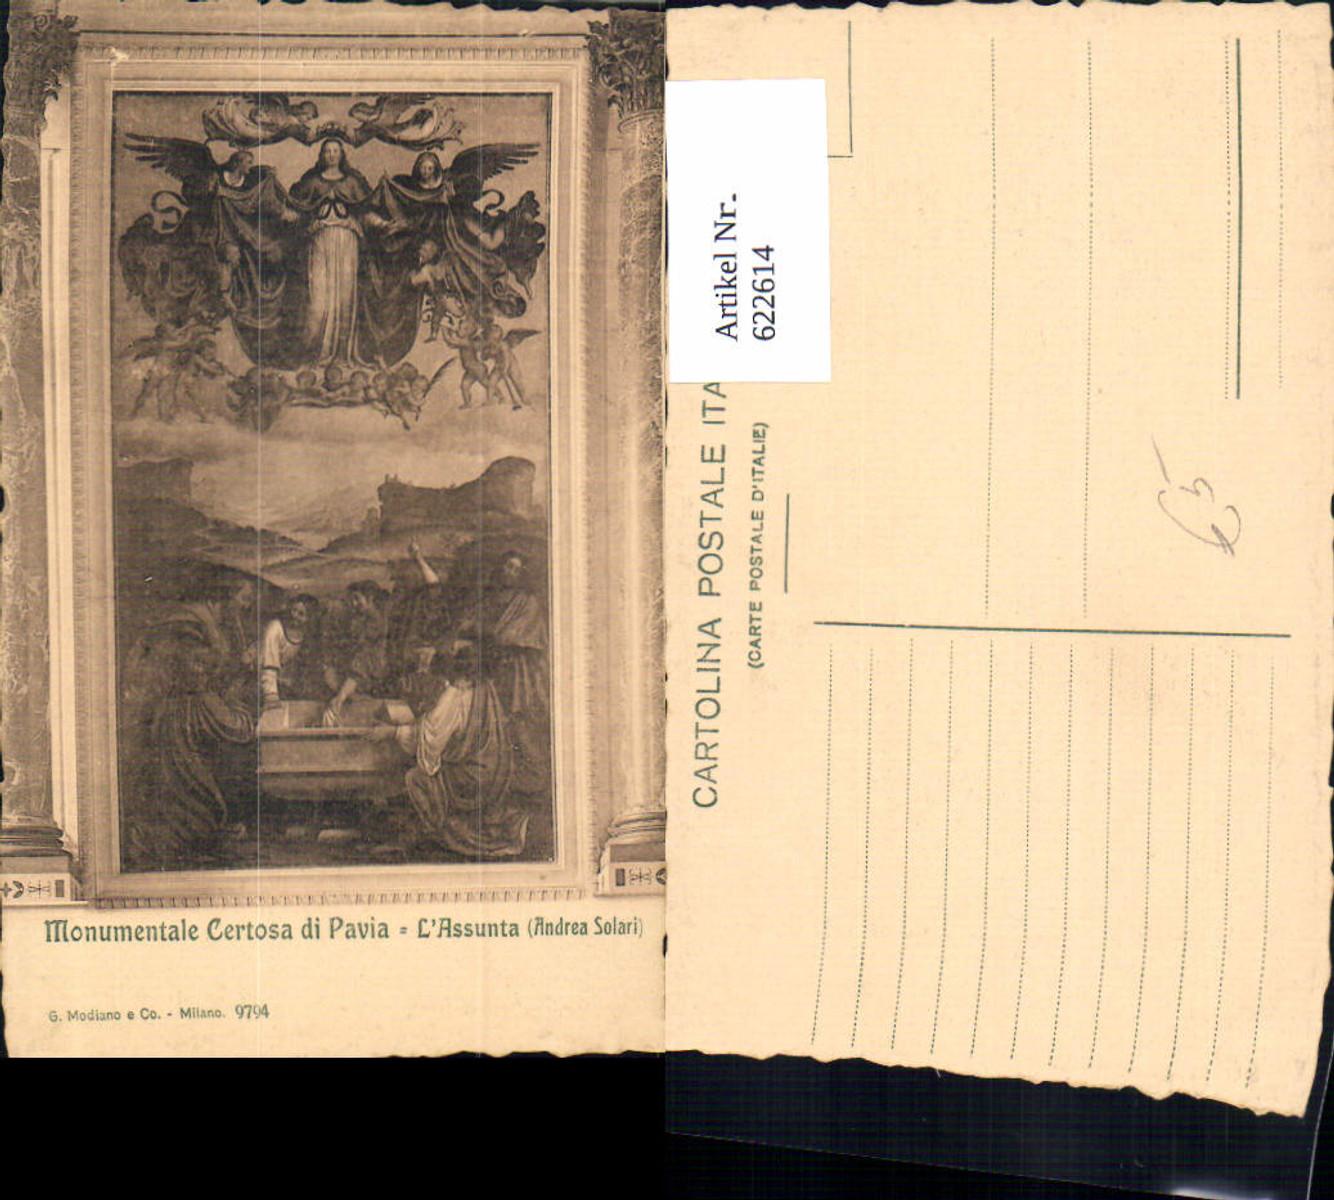 622614,Andrea Solari Monumentale Certosa di Pavia L Assunta Religion günstig online kaufen